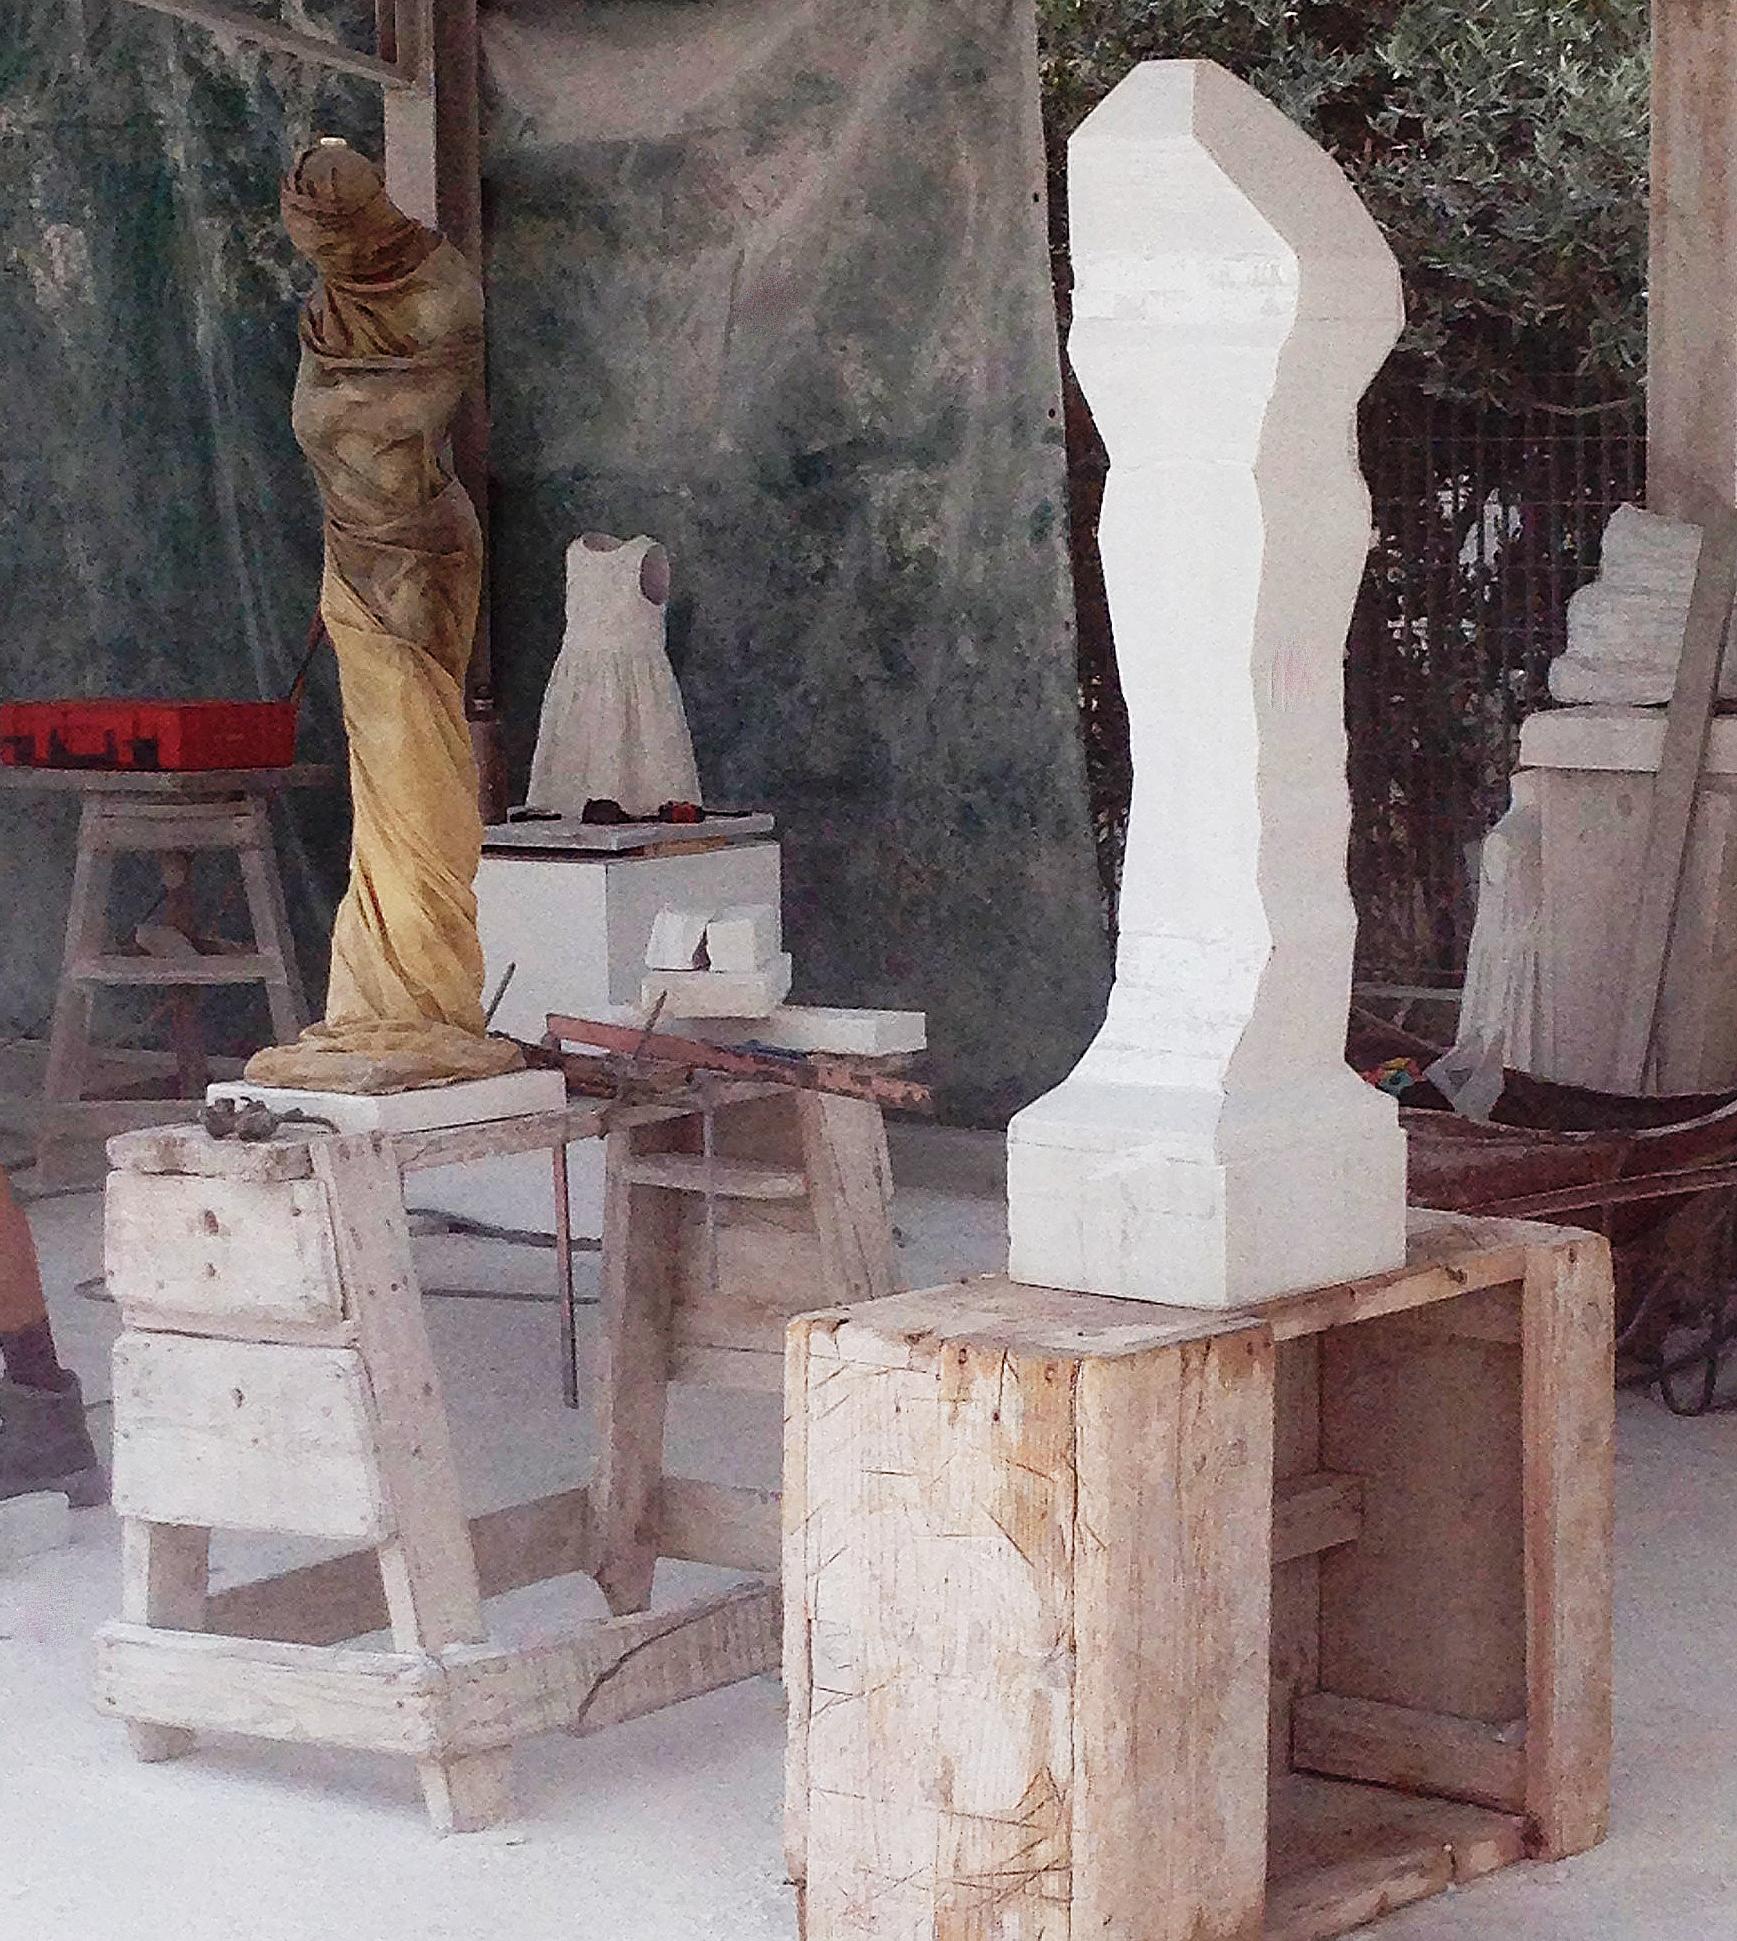 New-York-Academy-of-Art-Carrara-Residency-Josh-Henderson-Marco-Palli20171213_0151.jpg